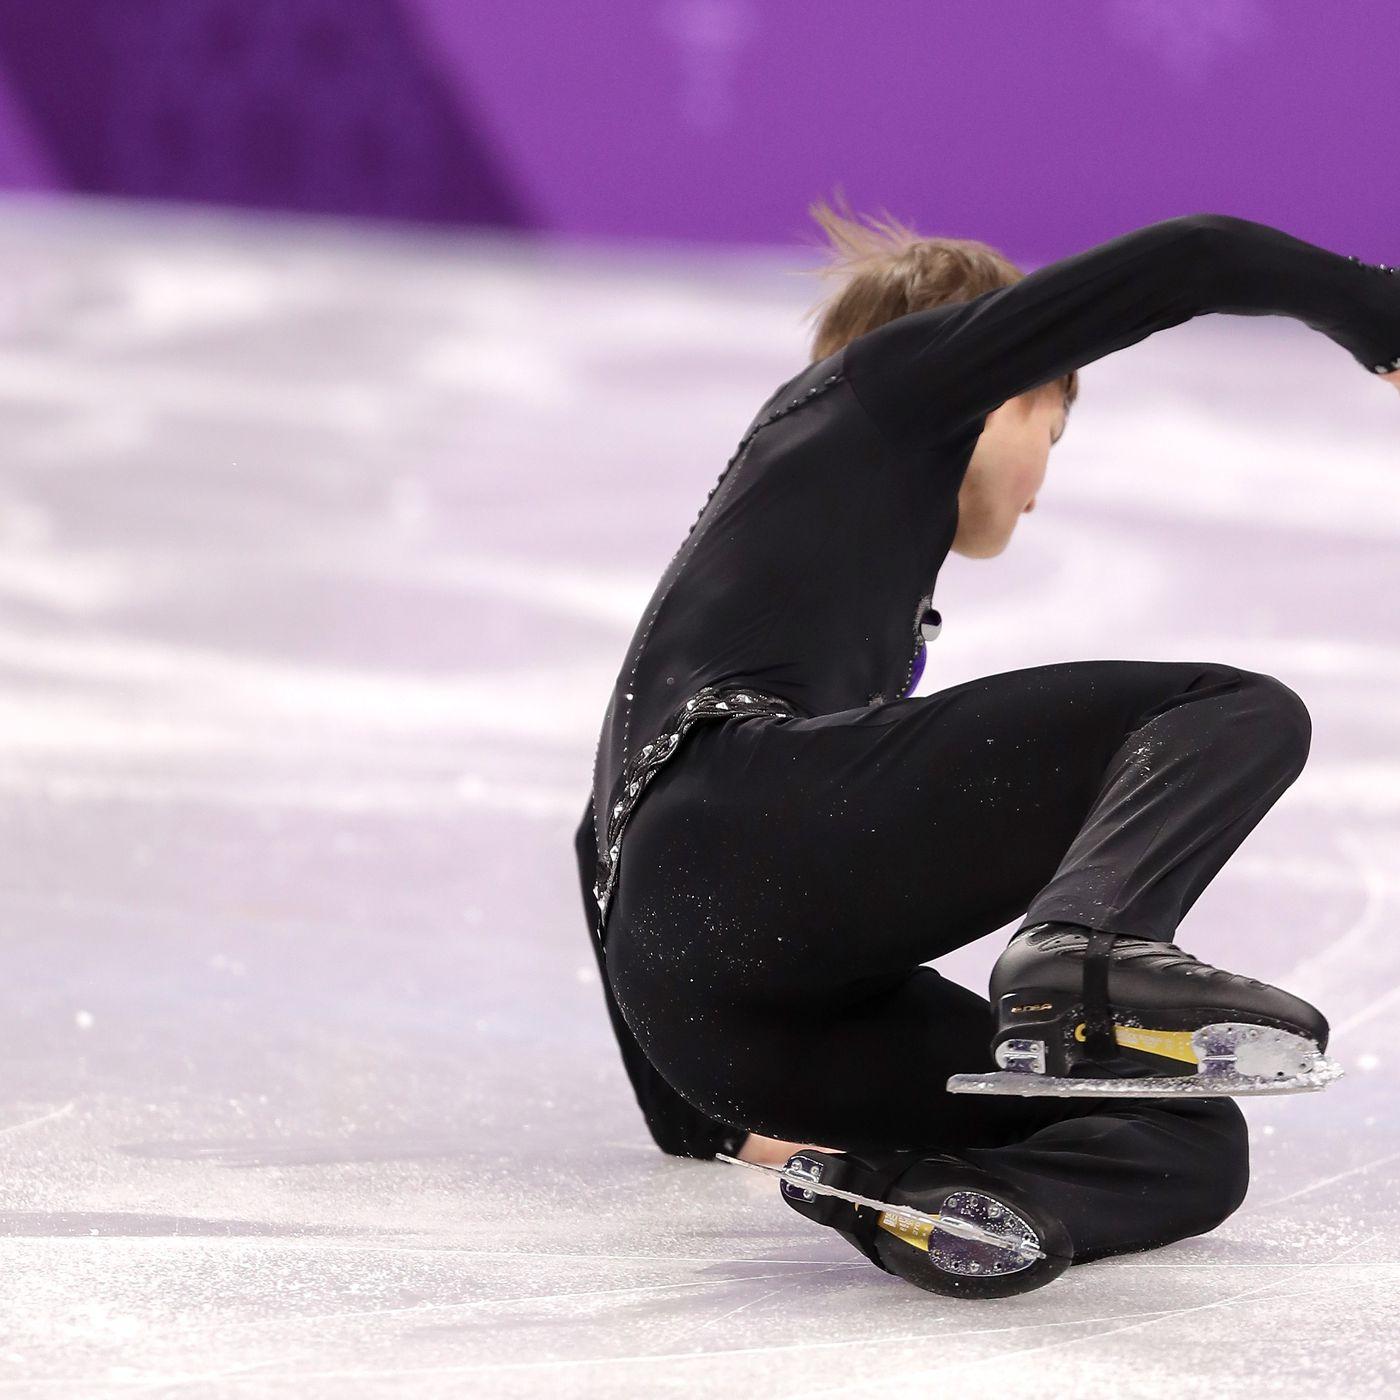 f8791bf0c81e Winter Olympics 2018: figure skating scoring, explained - Vox